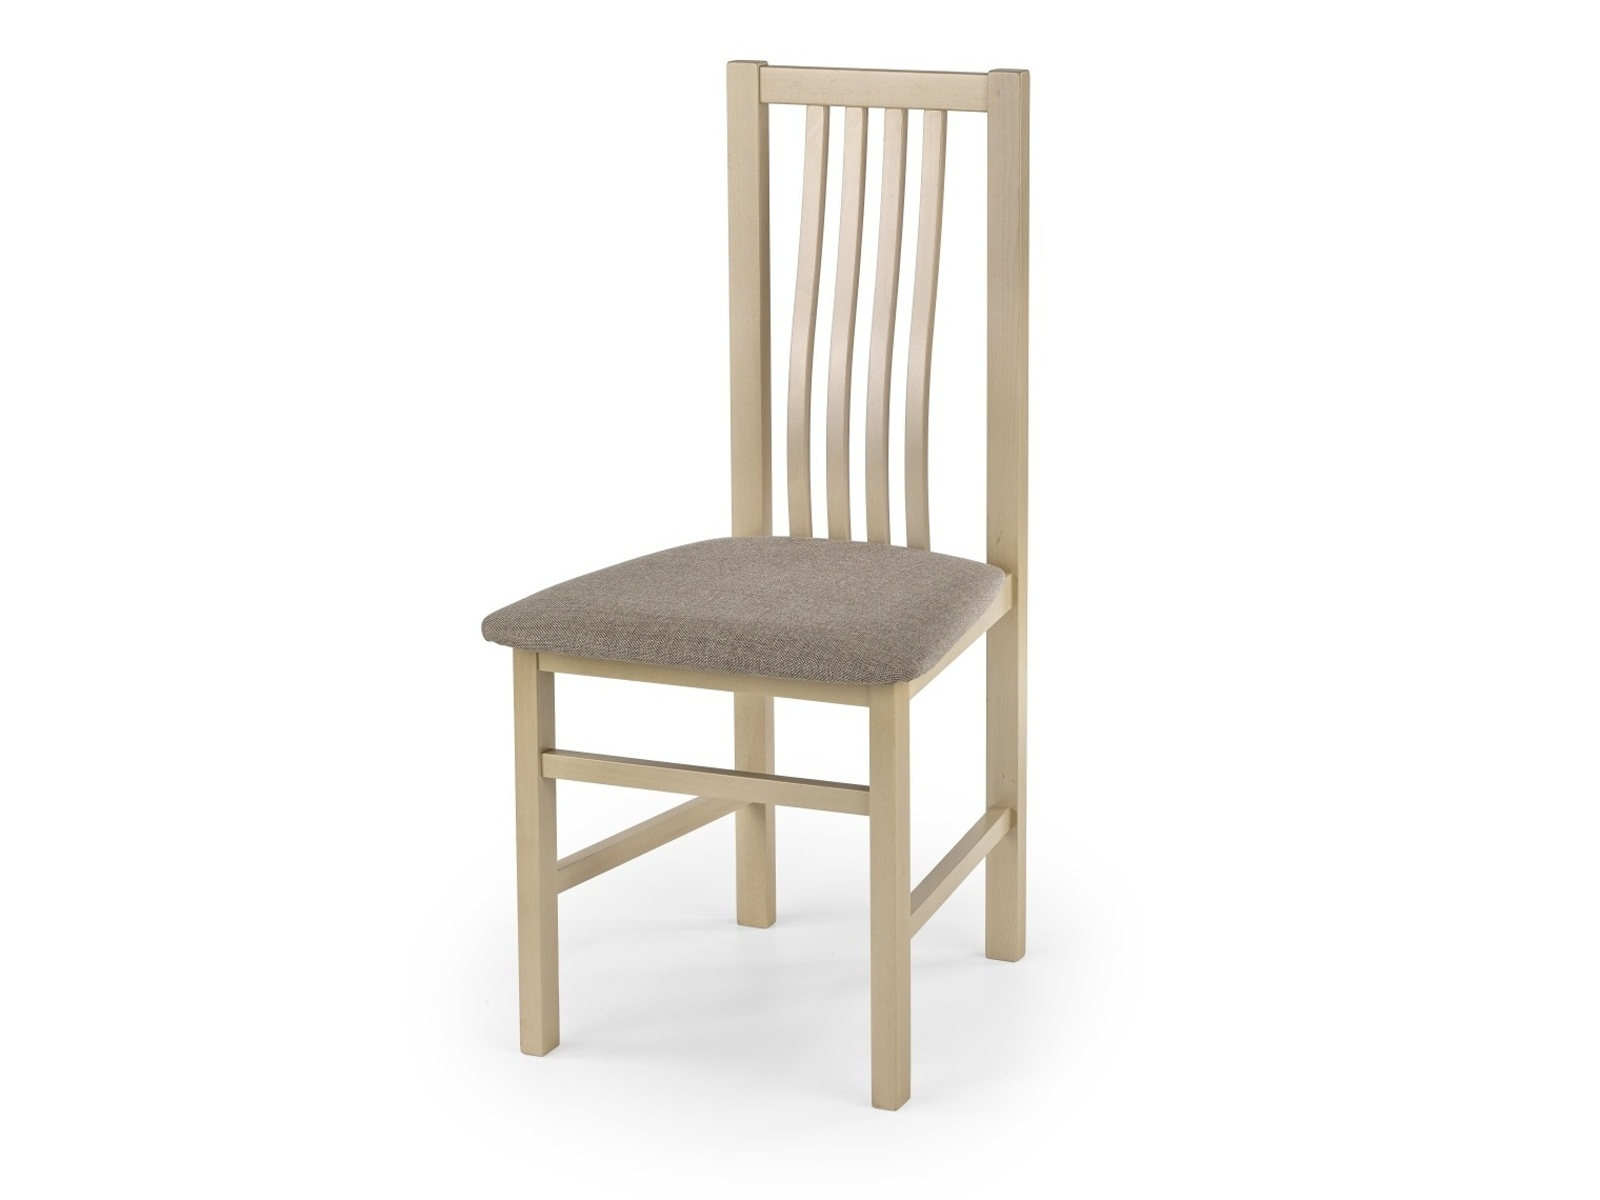 Halmar Jídelní židle PAWEL, dub sonoma